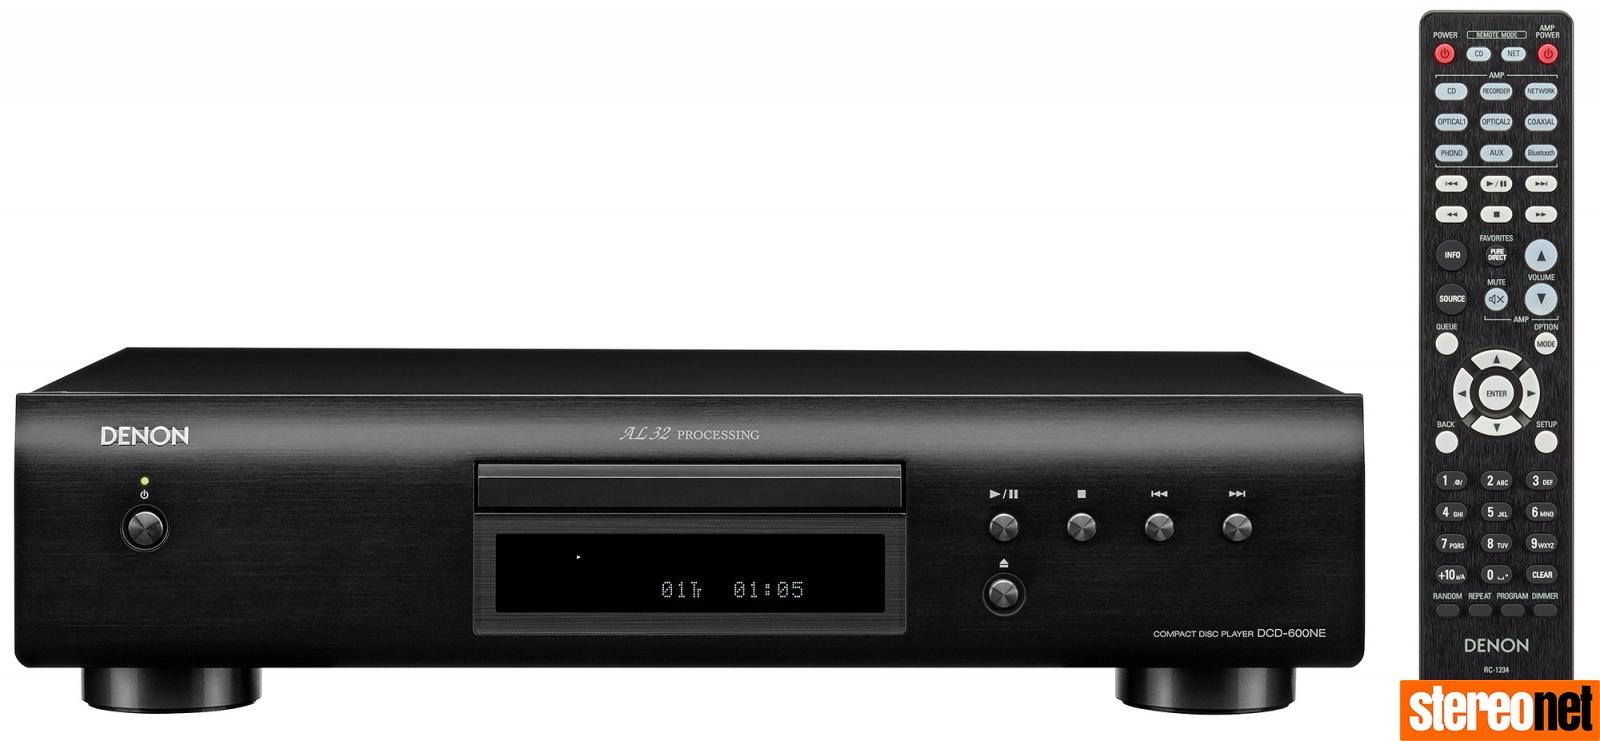 Denon CDC-600NE CD Player